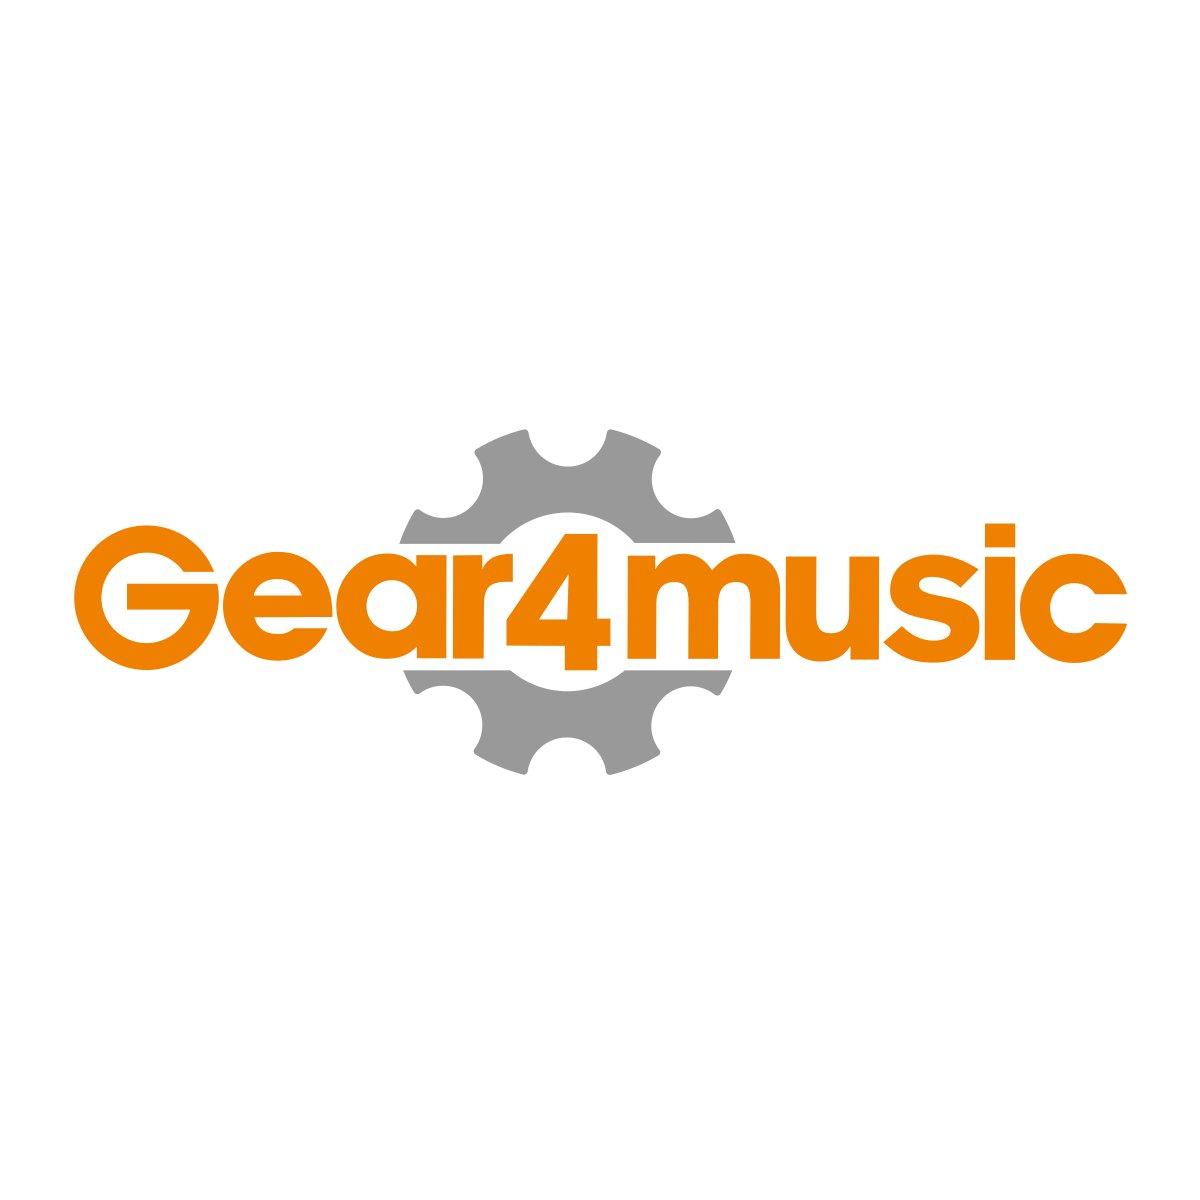 behringer u phoria umc22 usb audio interface at gear4music. Black Bedroom Furniture Sets. Home Design Ideas